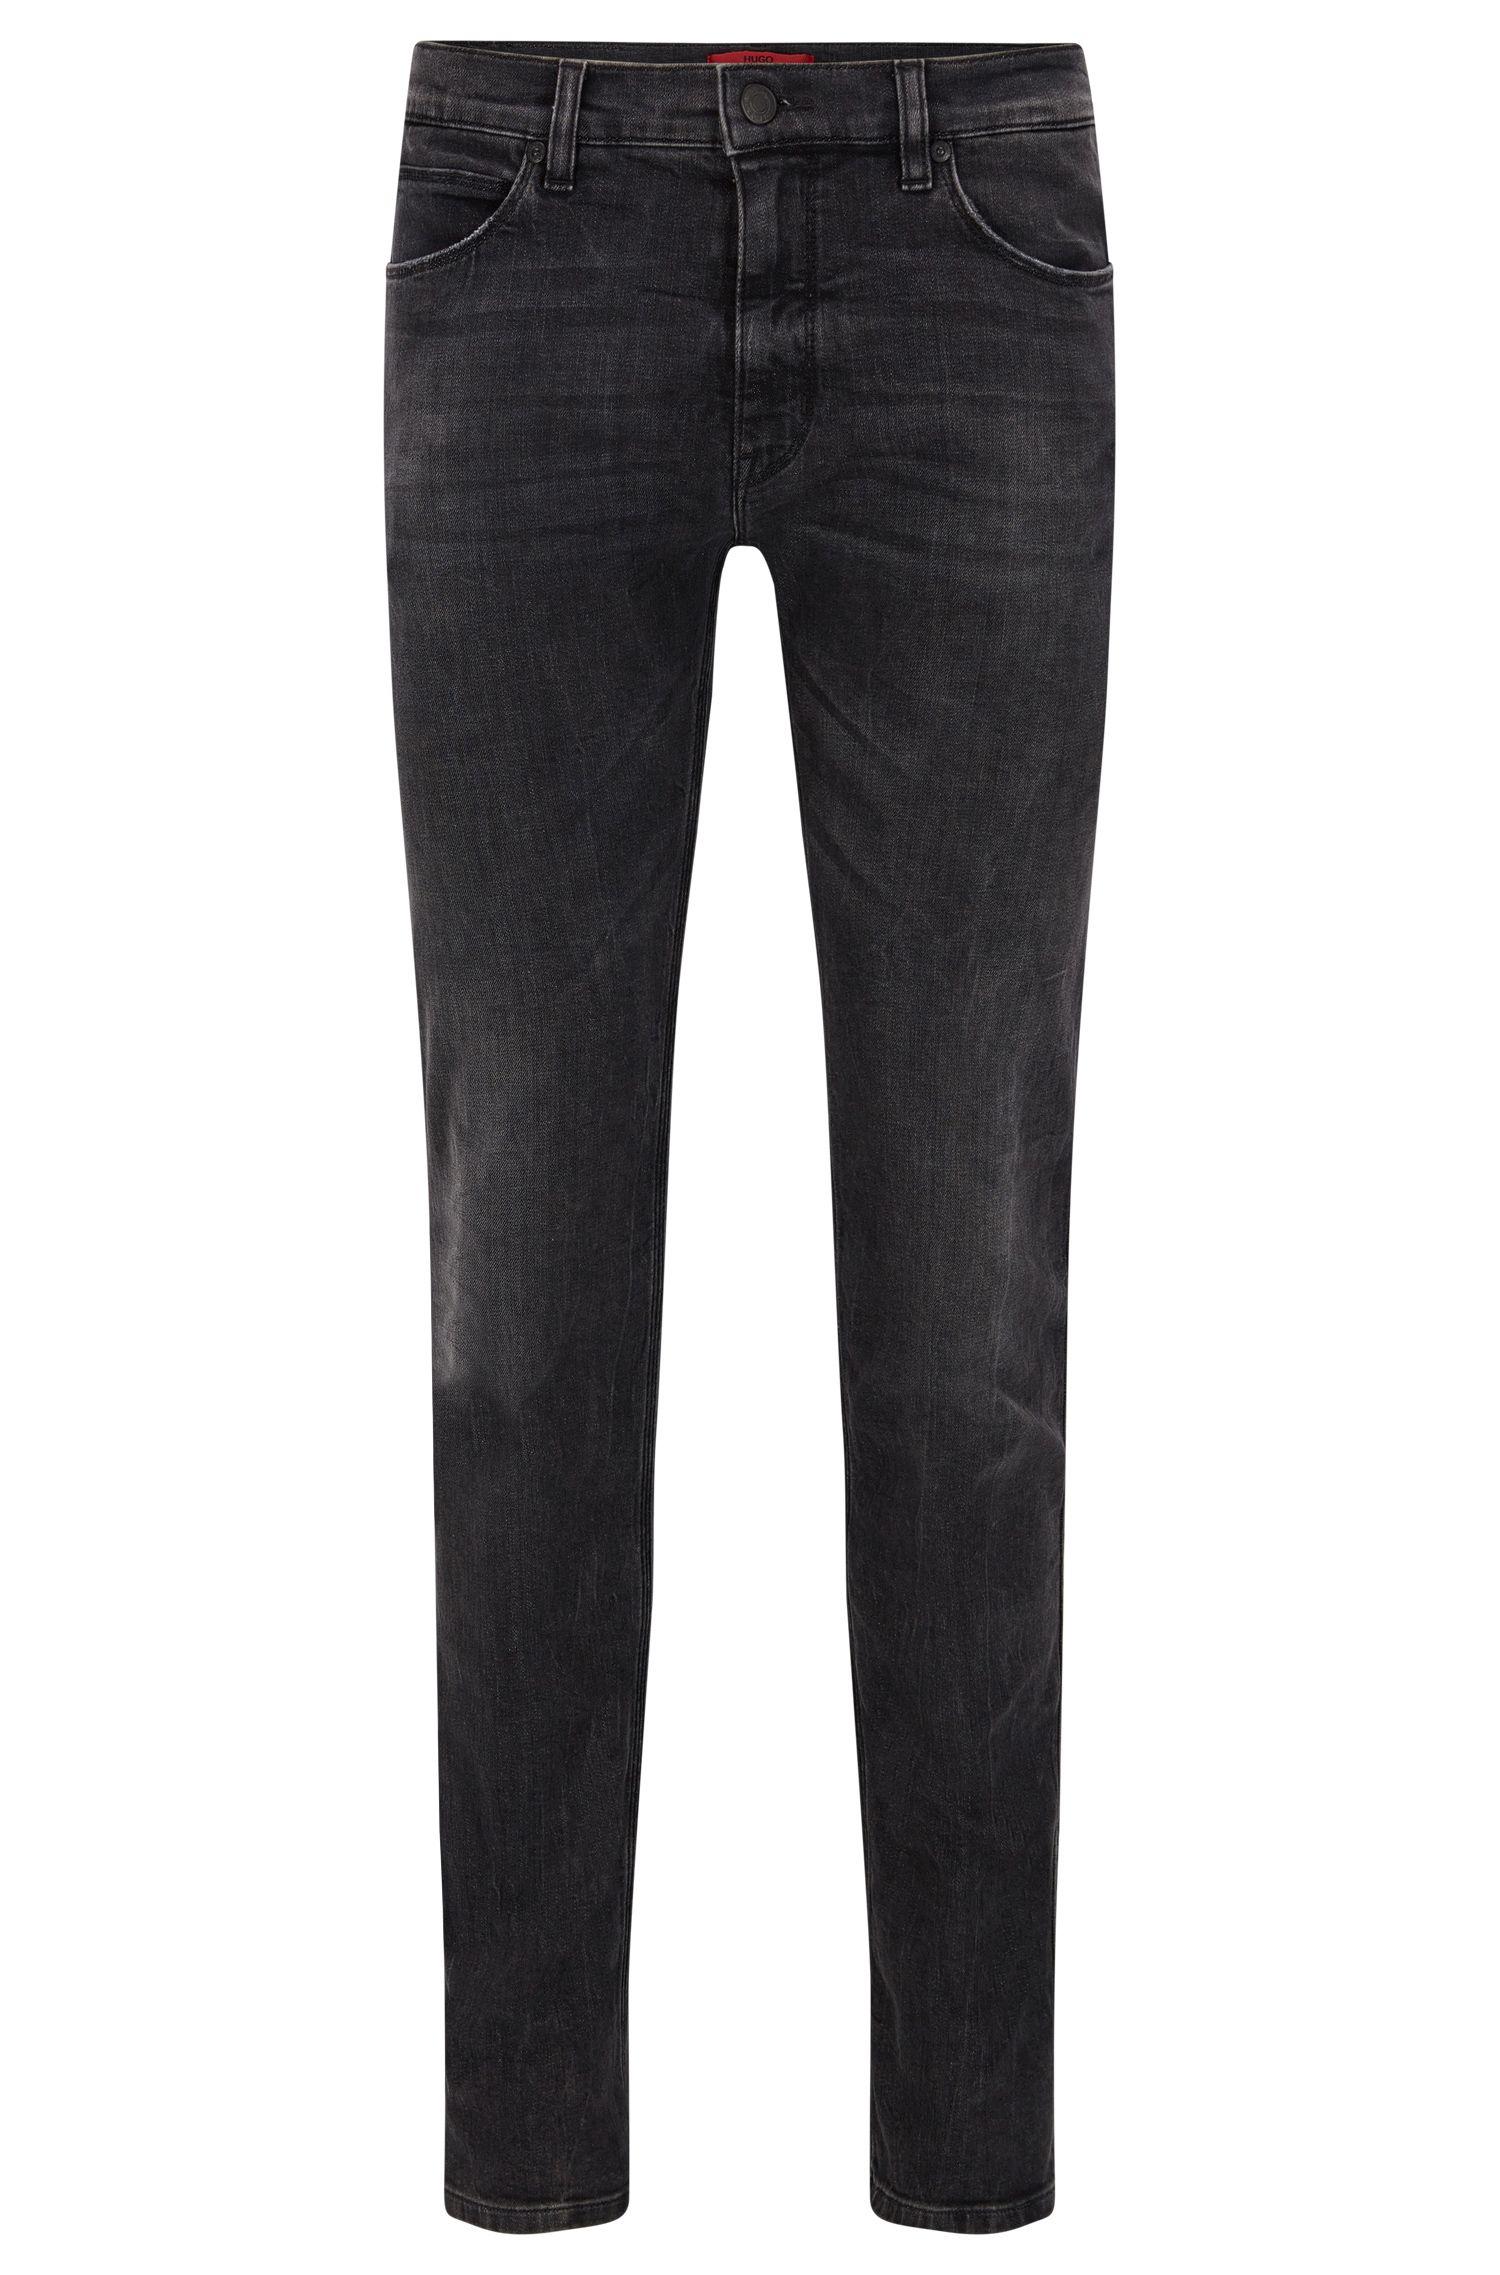 'HUGO 708' | Slim Fit, 9.5 oz Stretch Cotton Blend Jeans